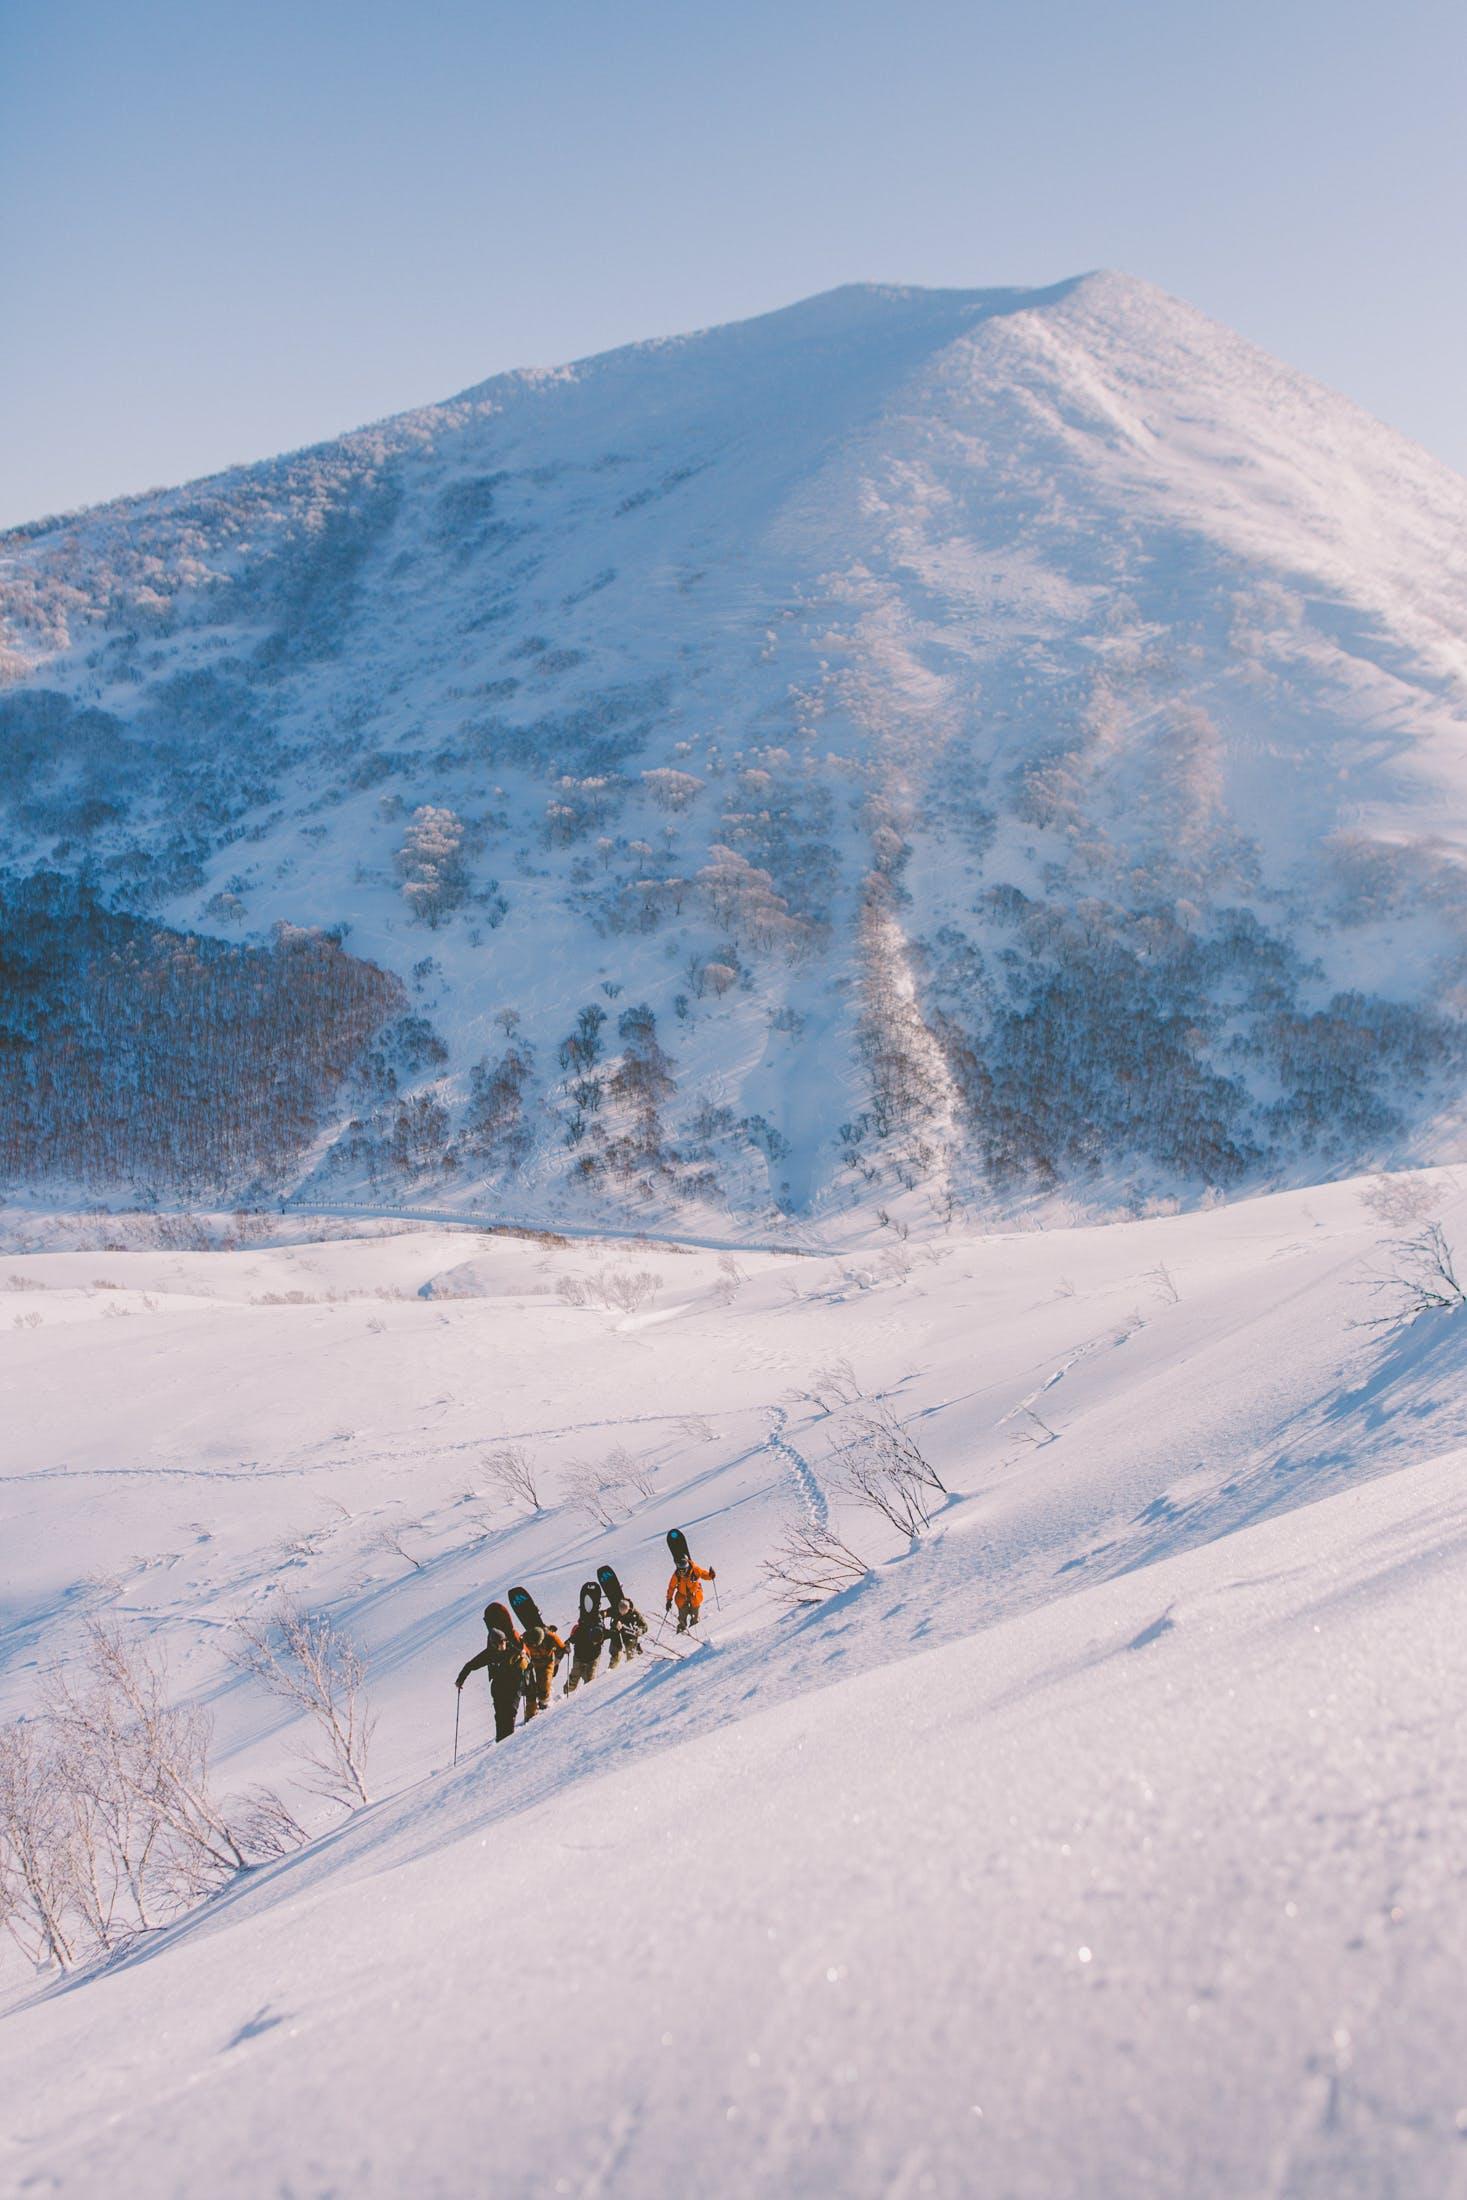 snowboarders backcountry hiking Niseko Japan